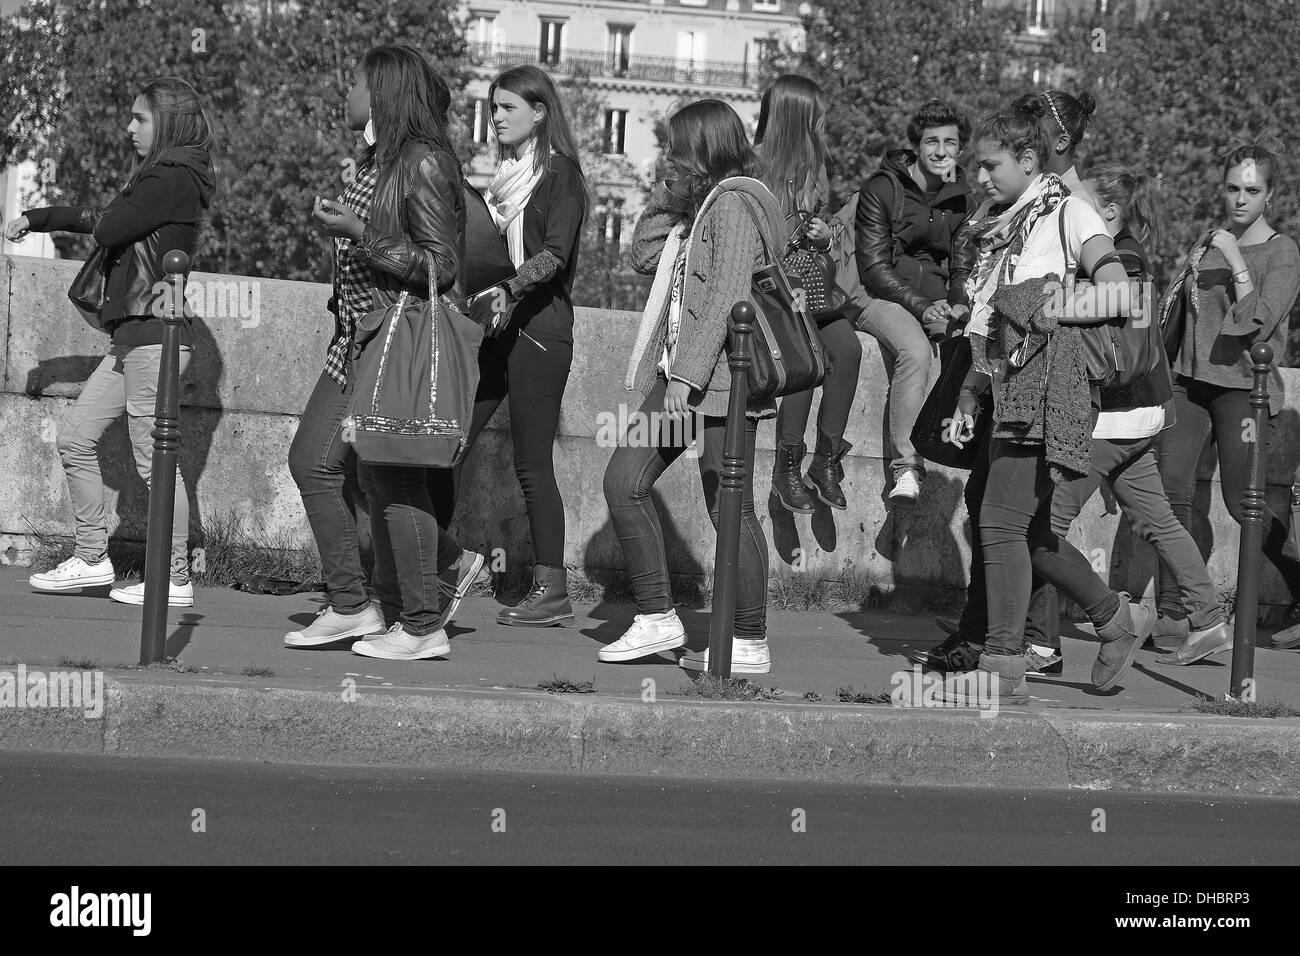 School kids after school time. - Stock Image